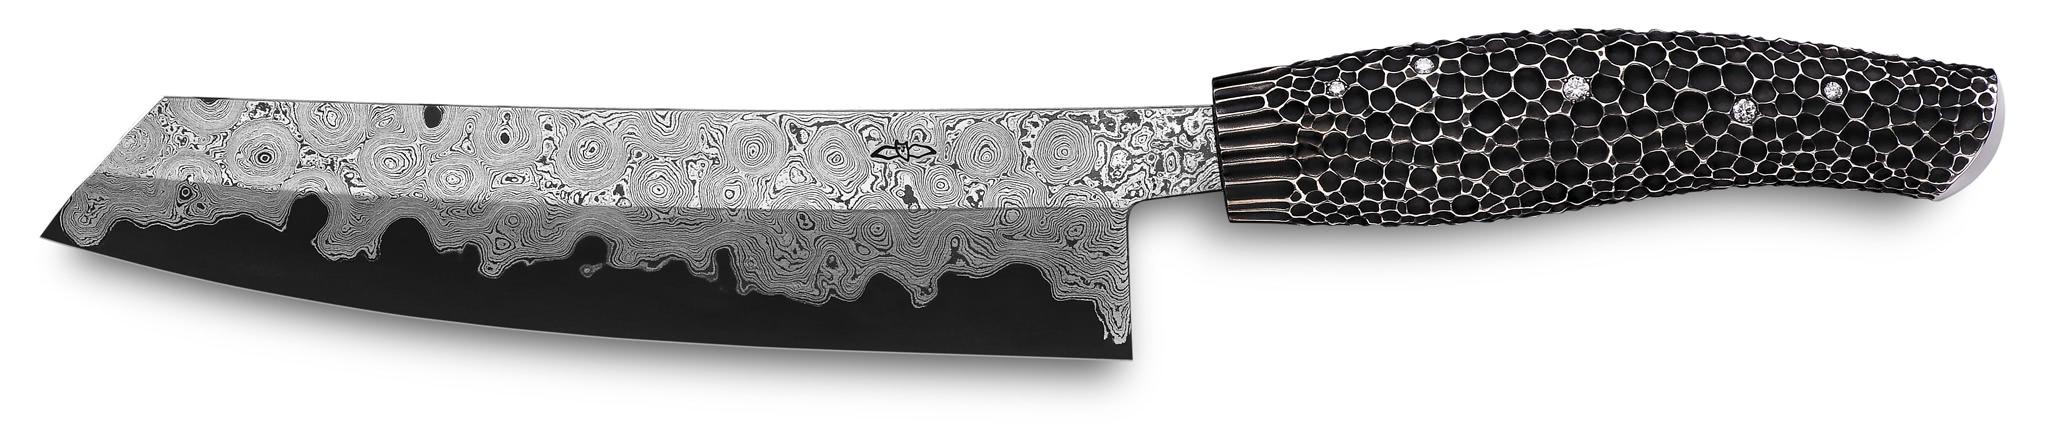 nesmuk exklusiv kochmesser massives silber 8 brillanten. Black Bedroom Furniture Sets. Home Design Ideas